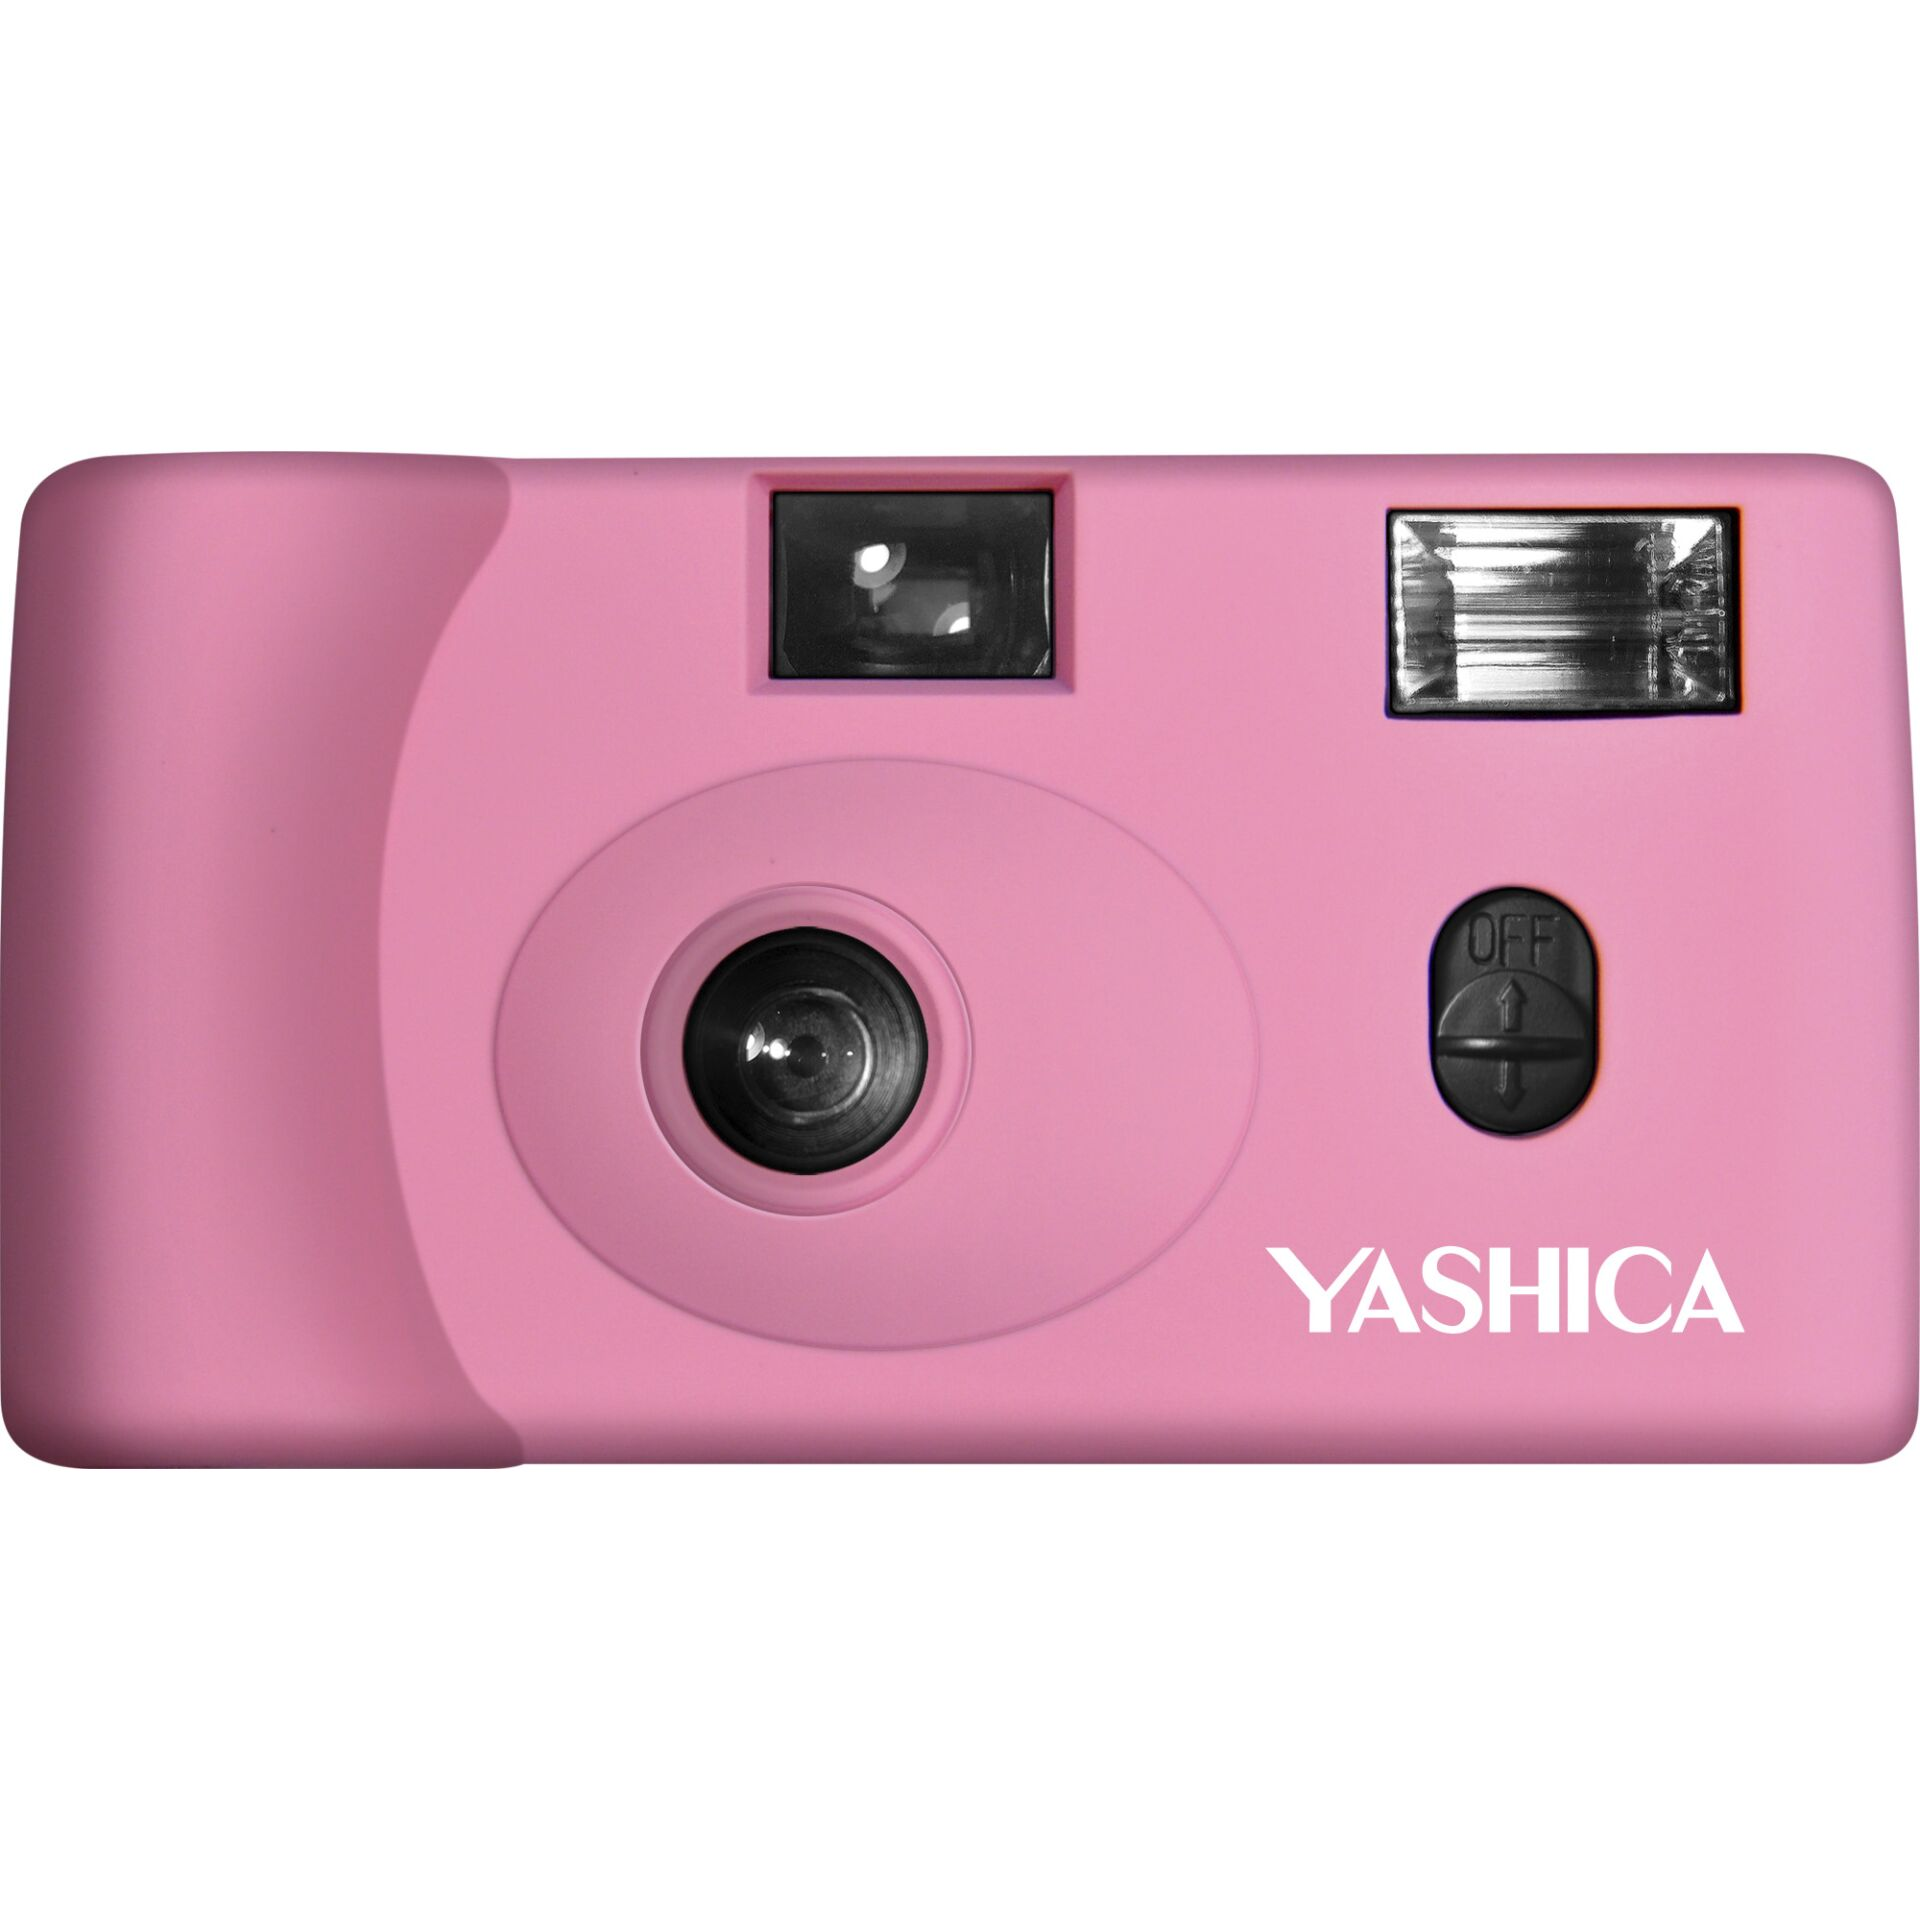 Yashica MF1 Snapshot Art pink